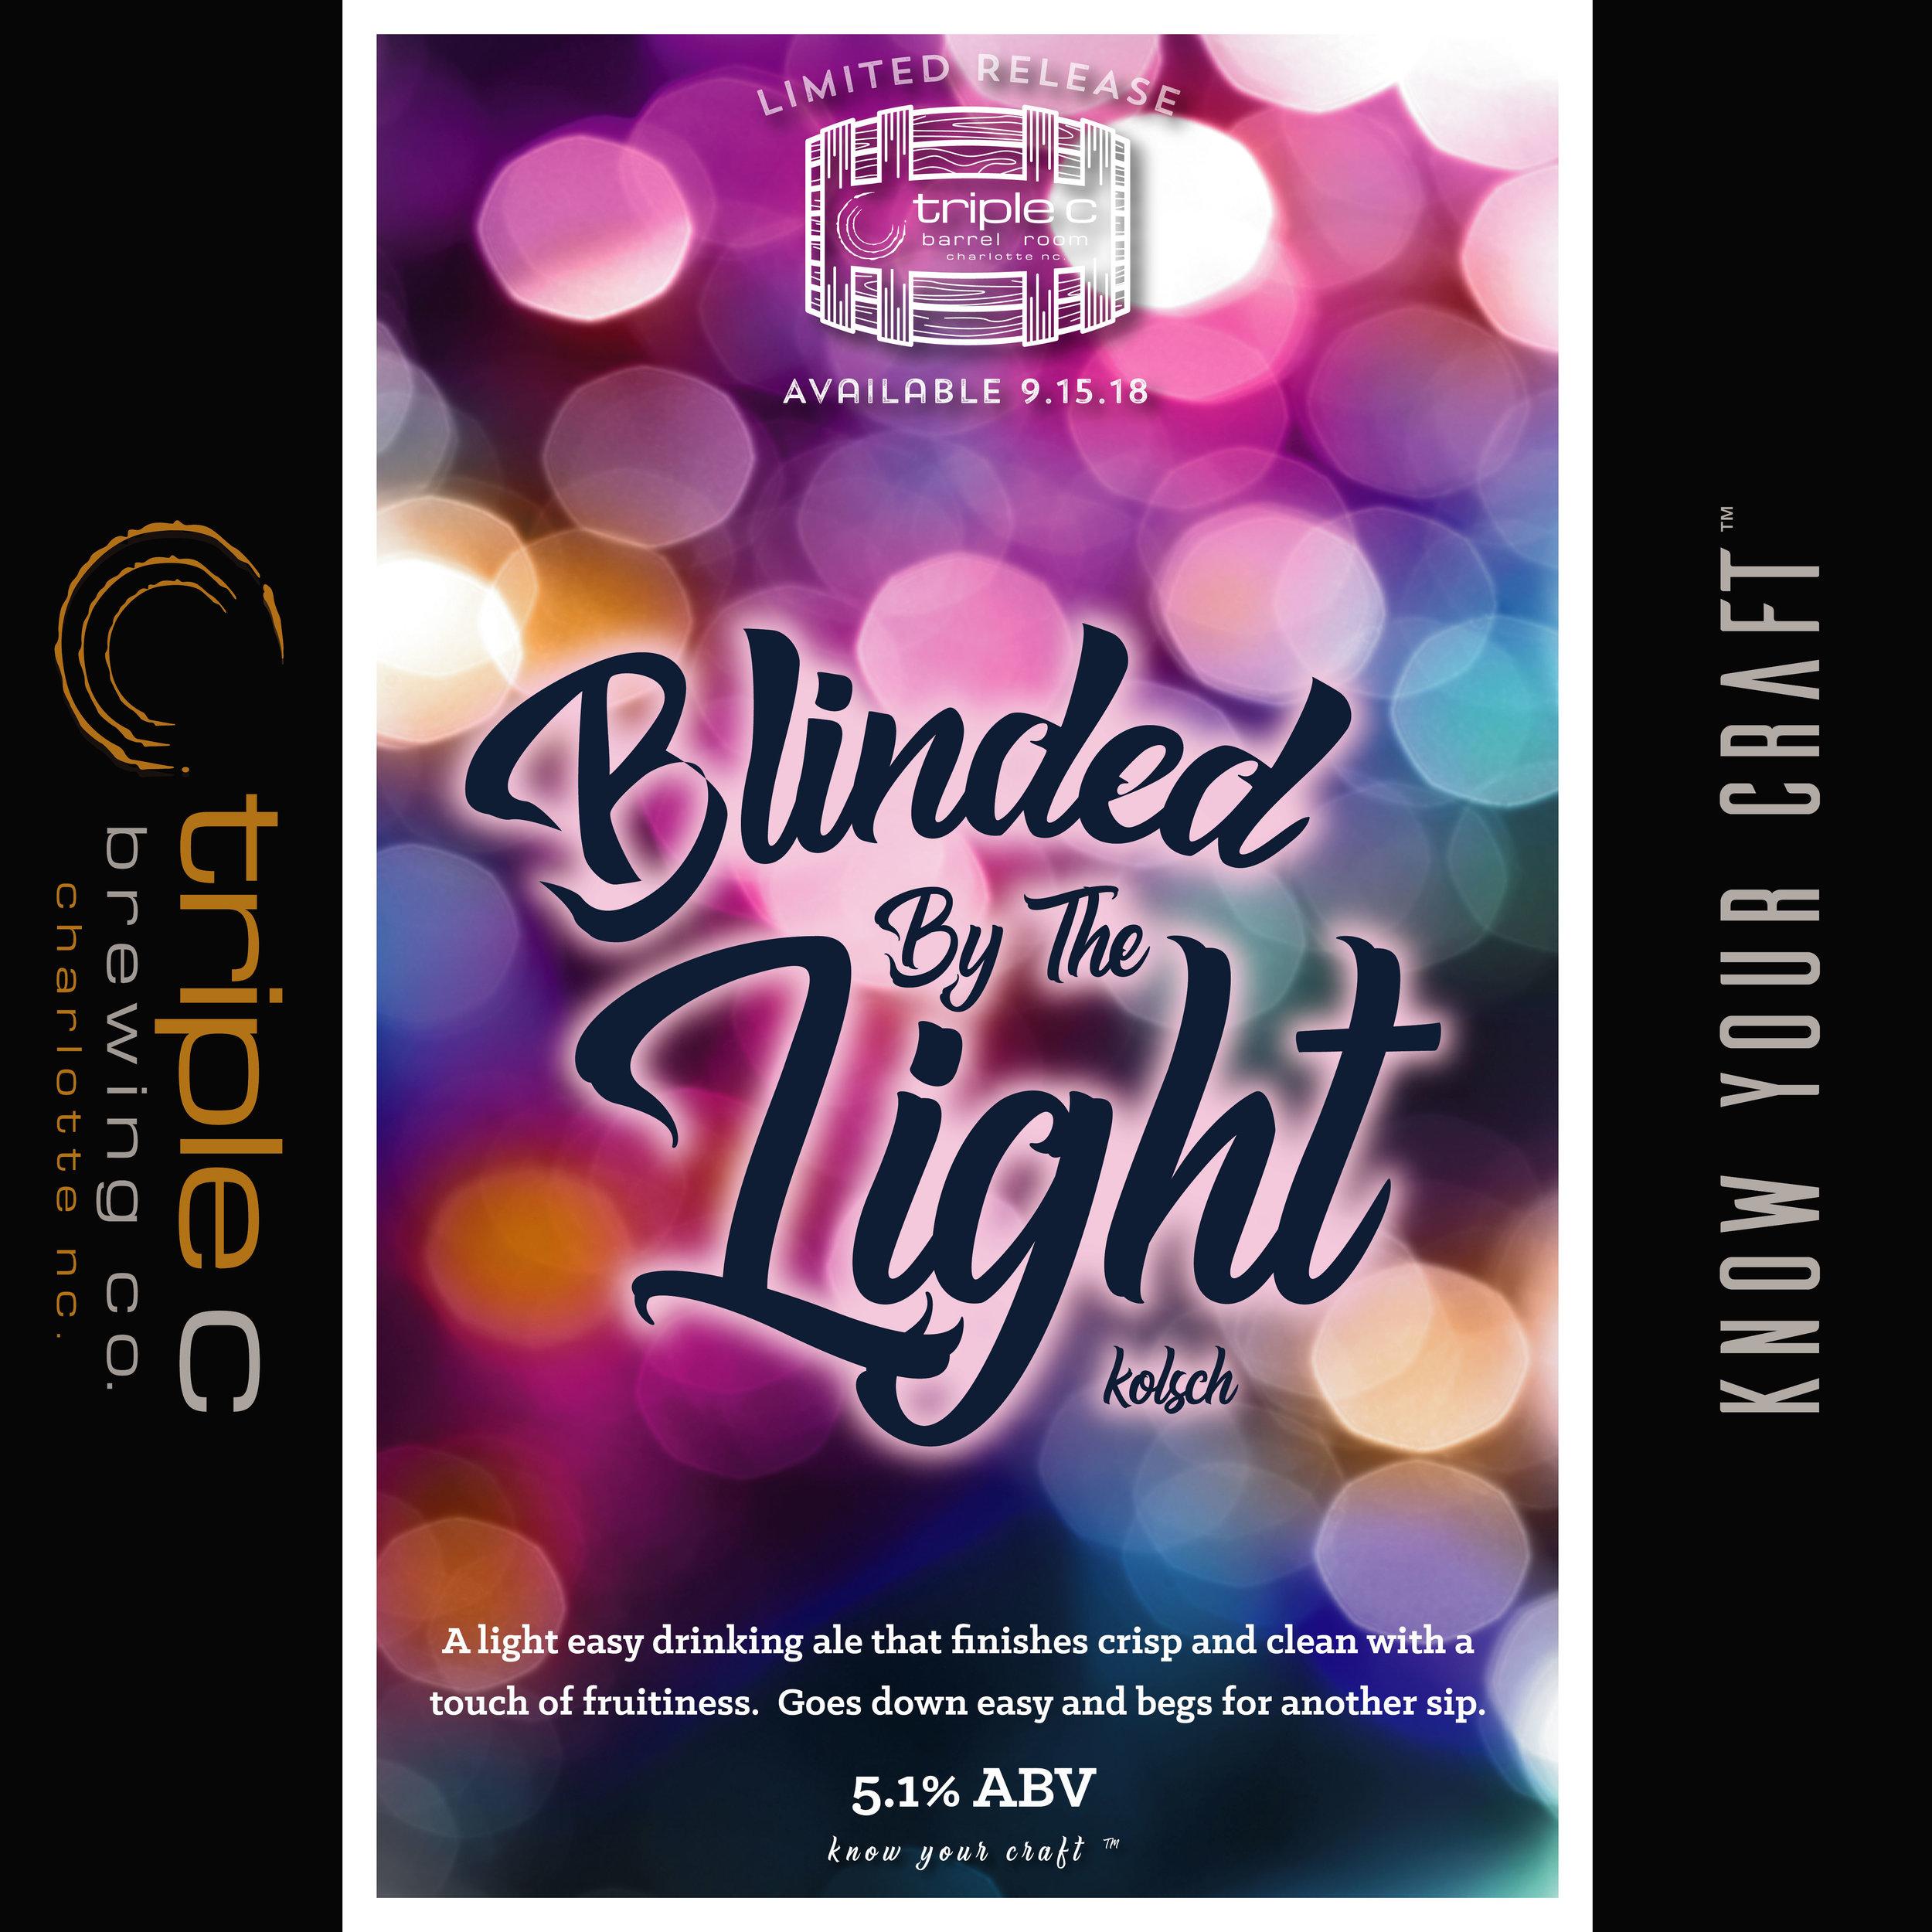 BlindedByTheLight_Media.jpg